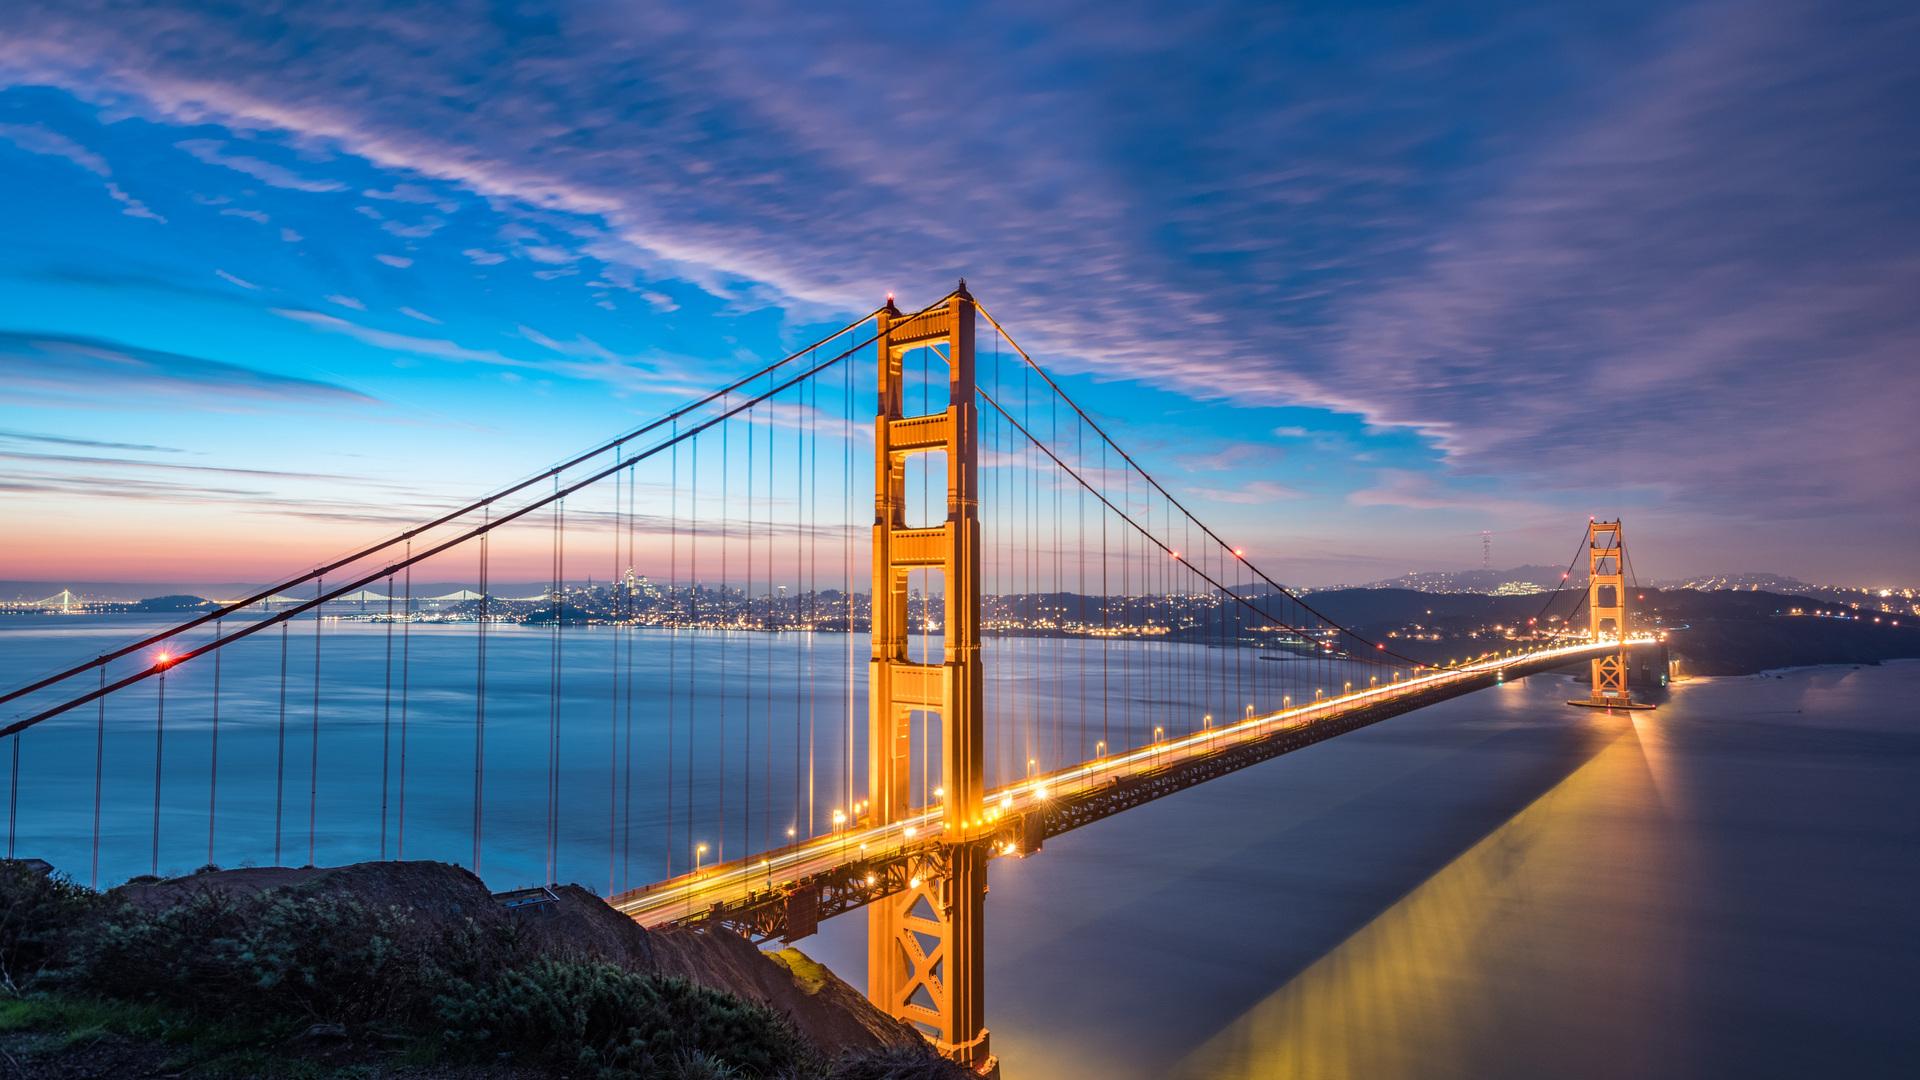 1920x1080 Golden Gate Bridge 8k Laptop Full Hd 1080p Hd 4k